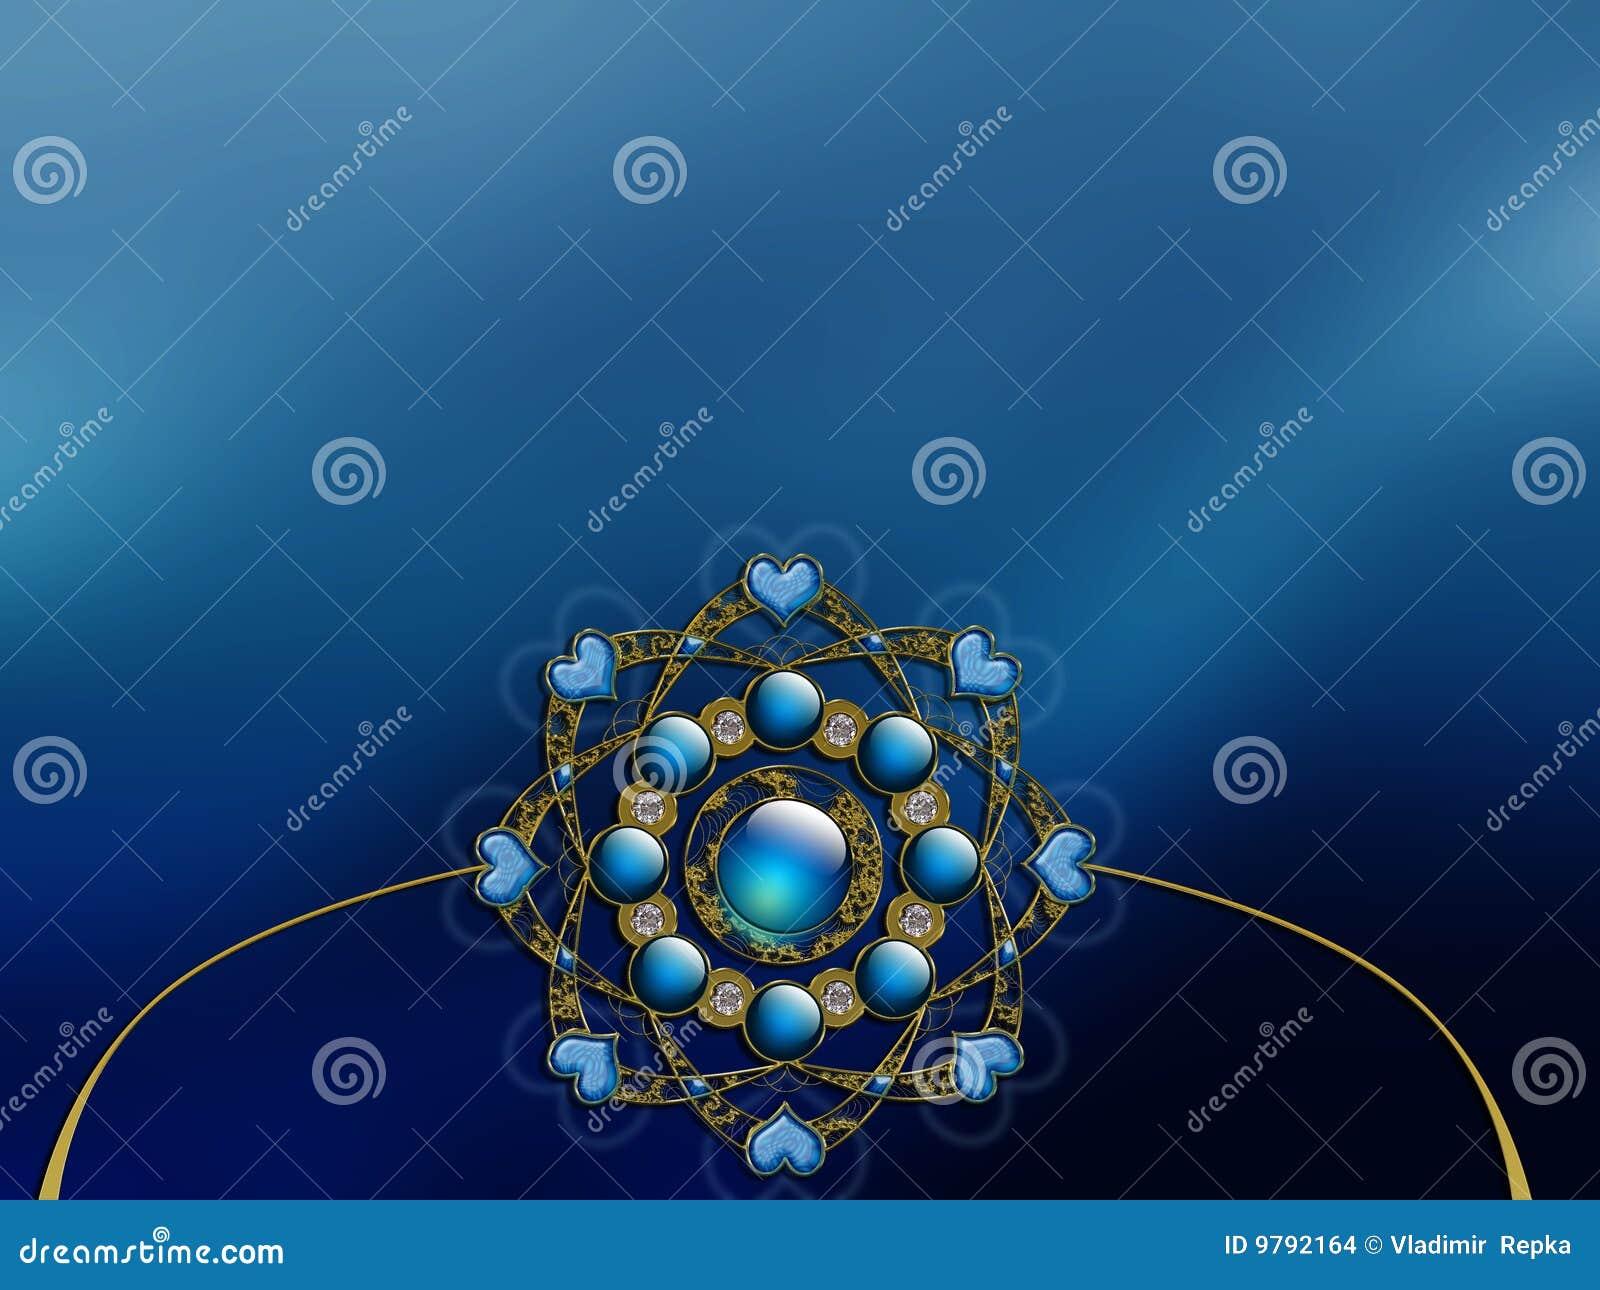 Vectorized Photo Background fractal layout design